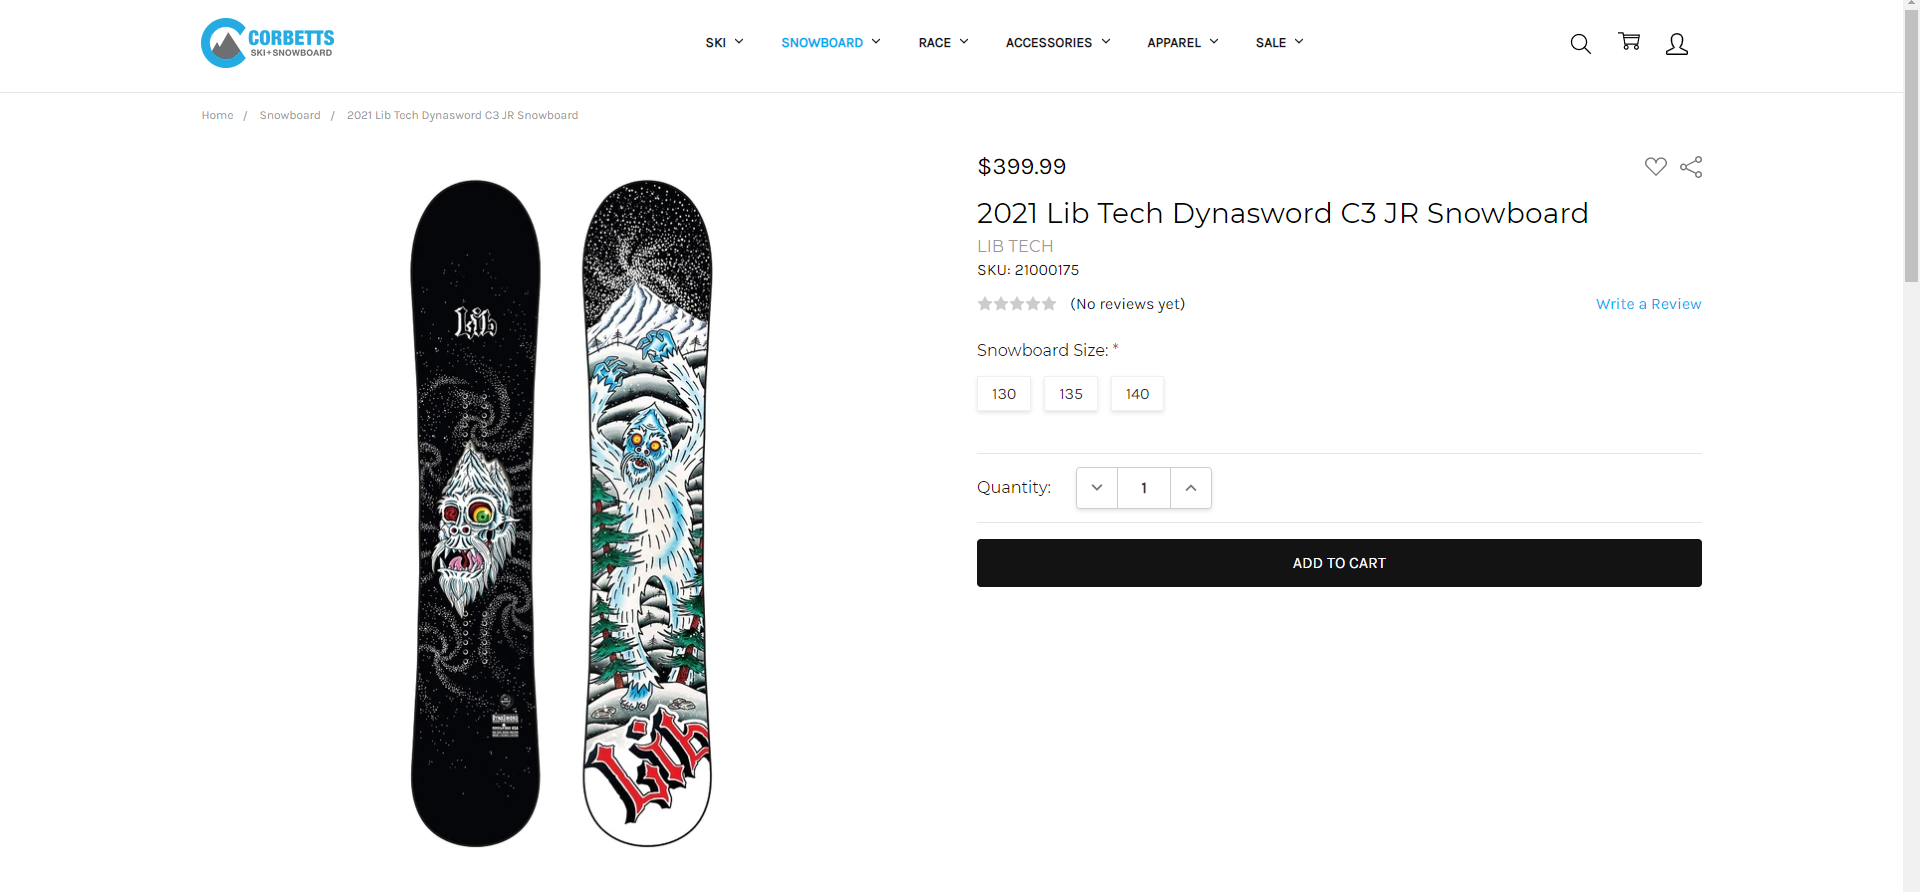 Best Snowboards 2021 - Lib Tech Dynasword C3 Jr